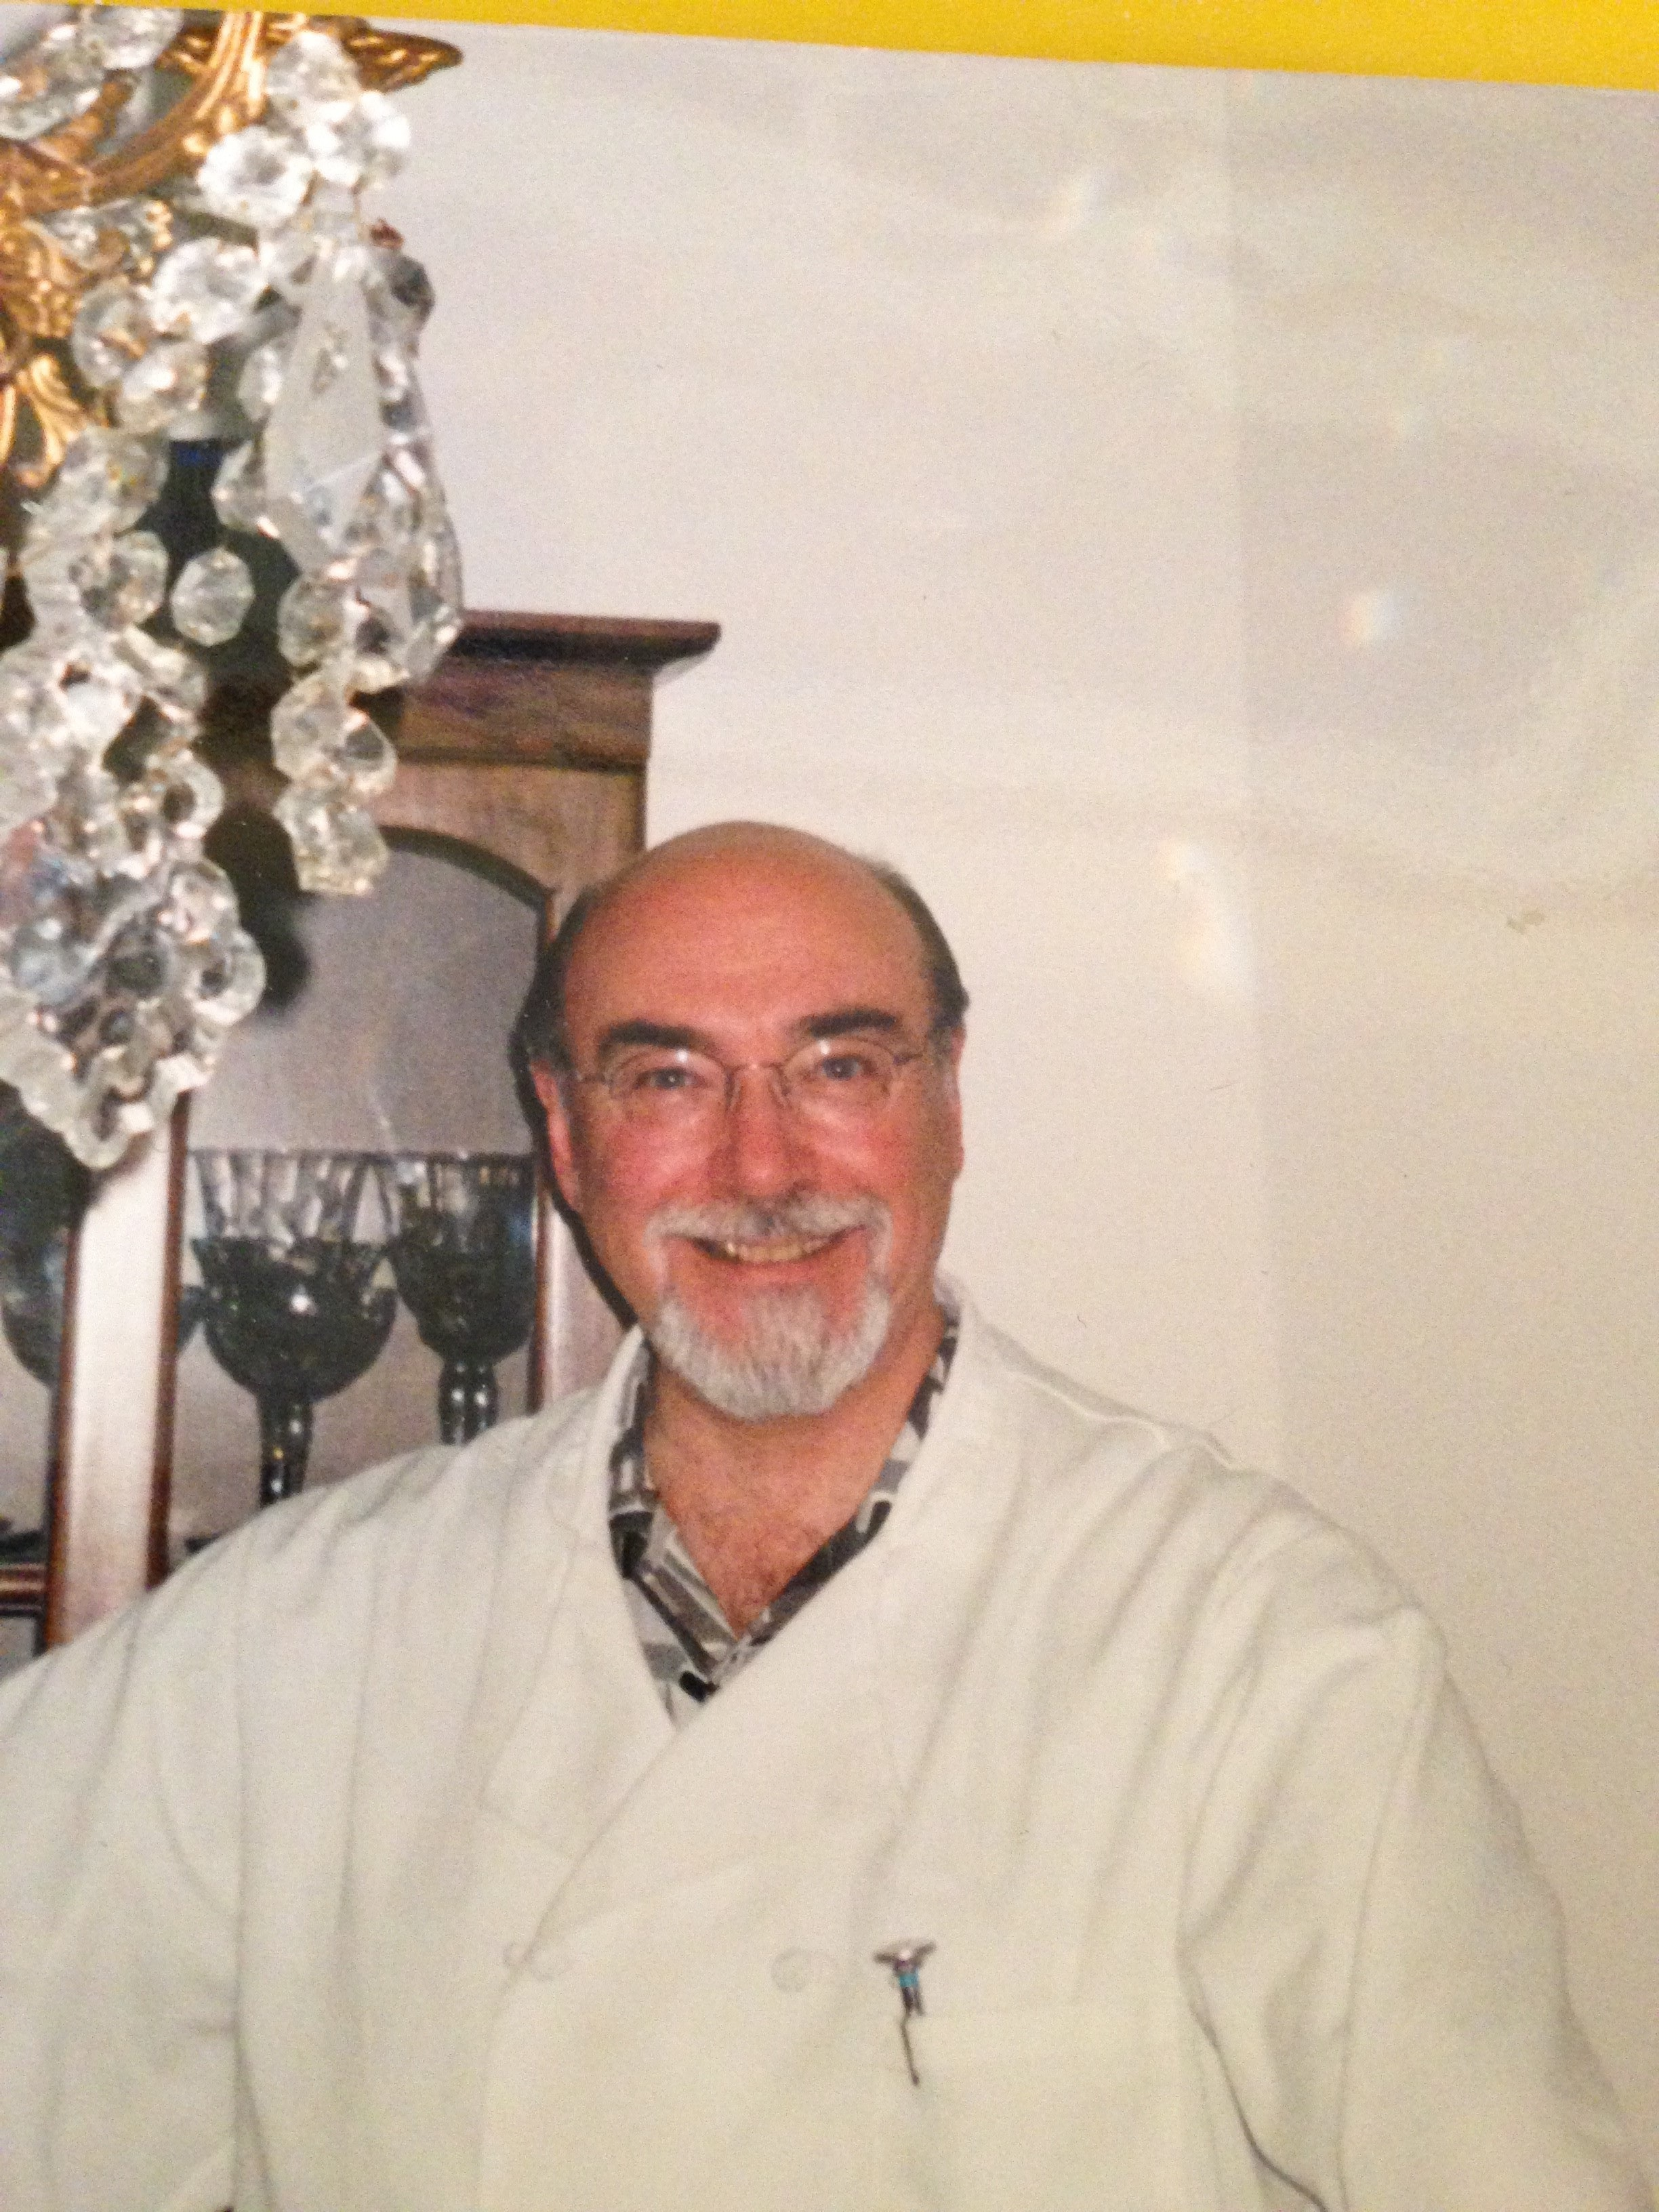 Stu Borken